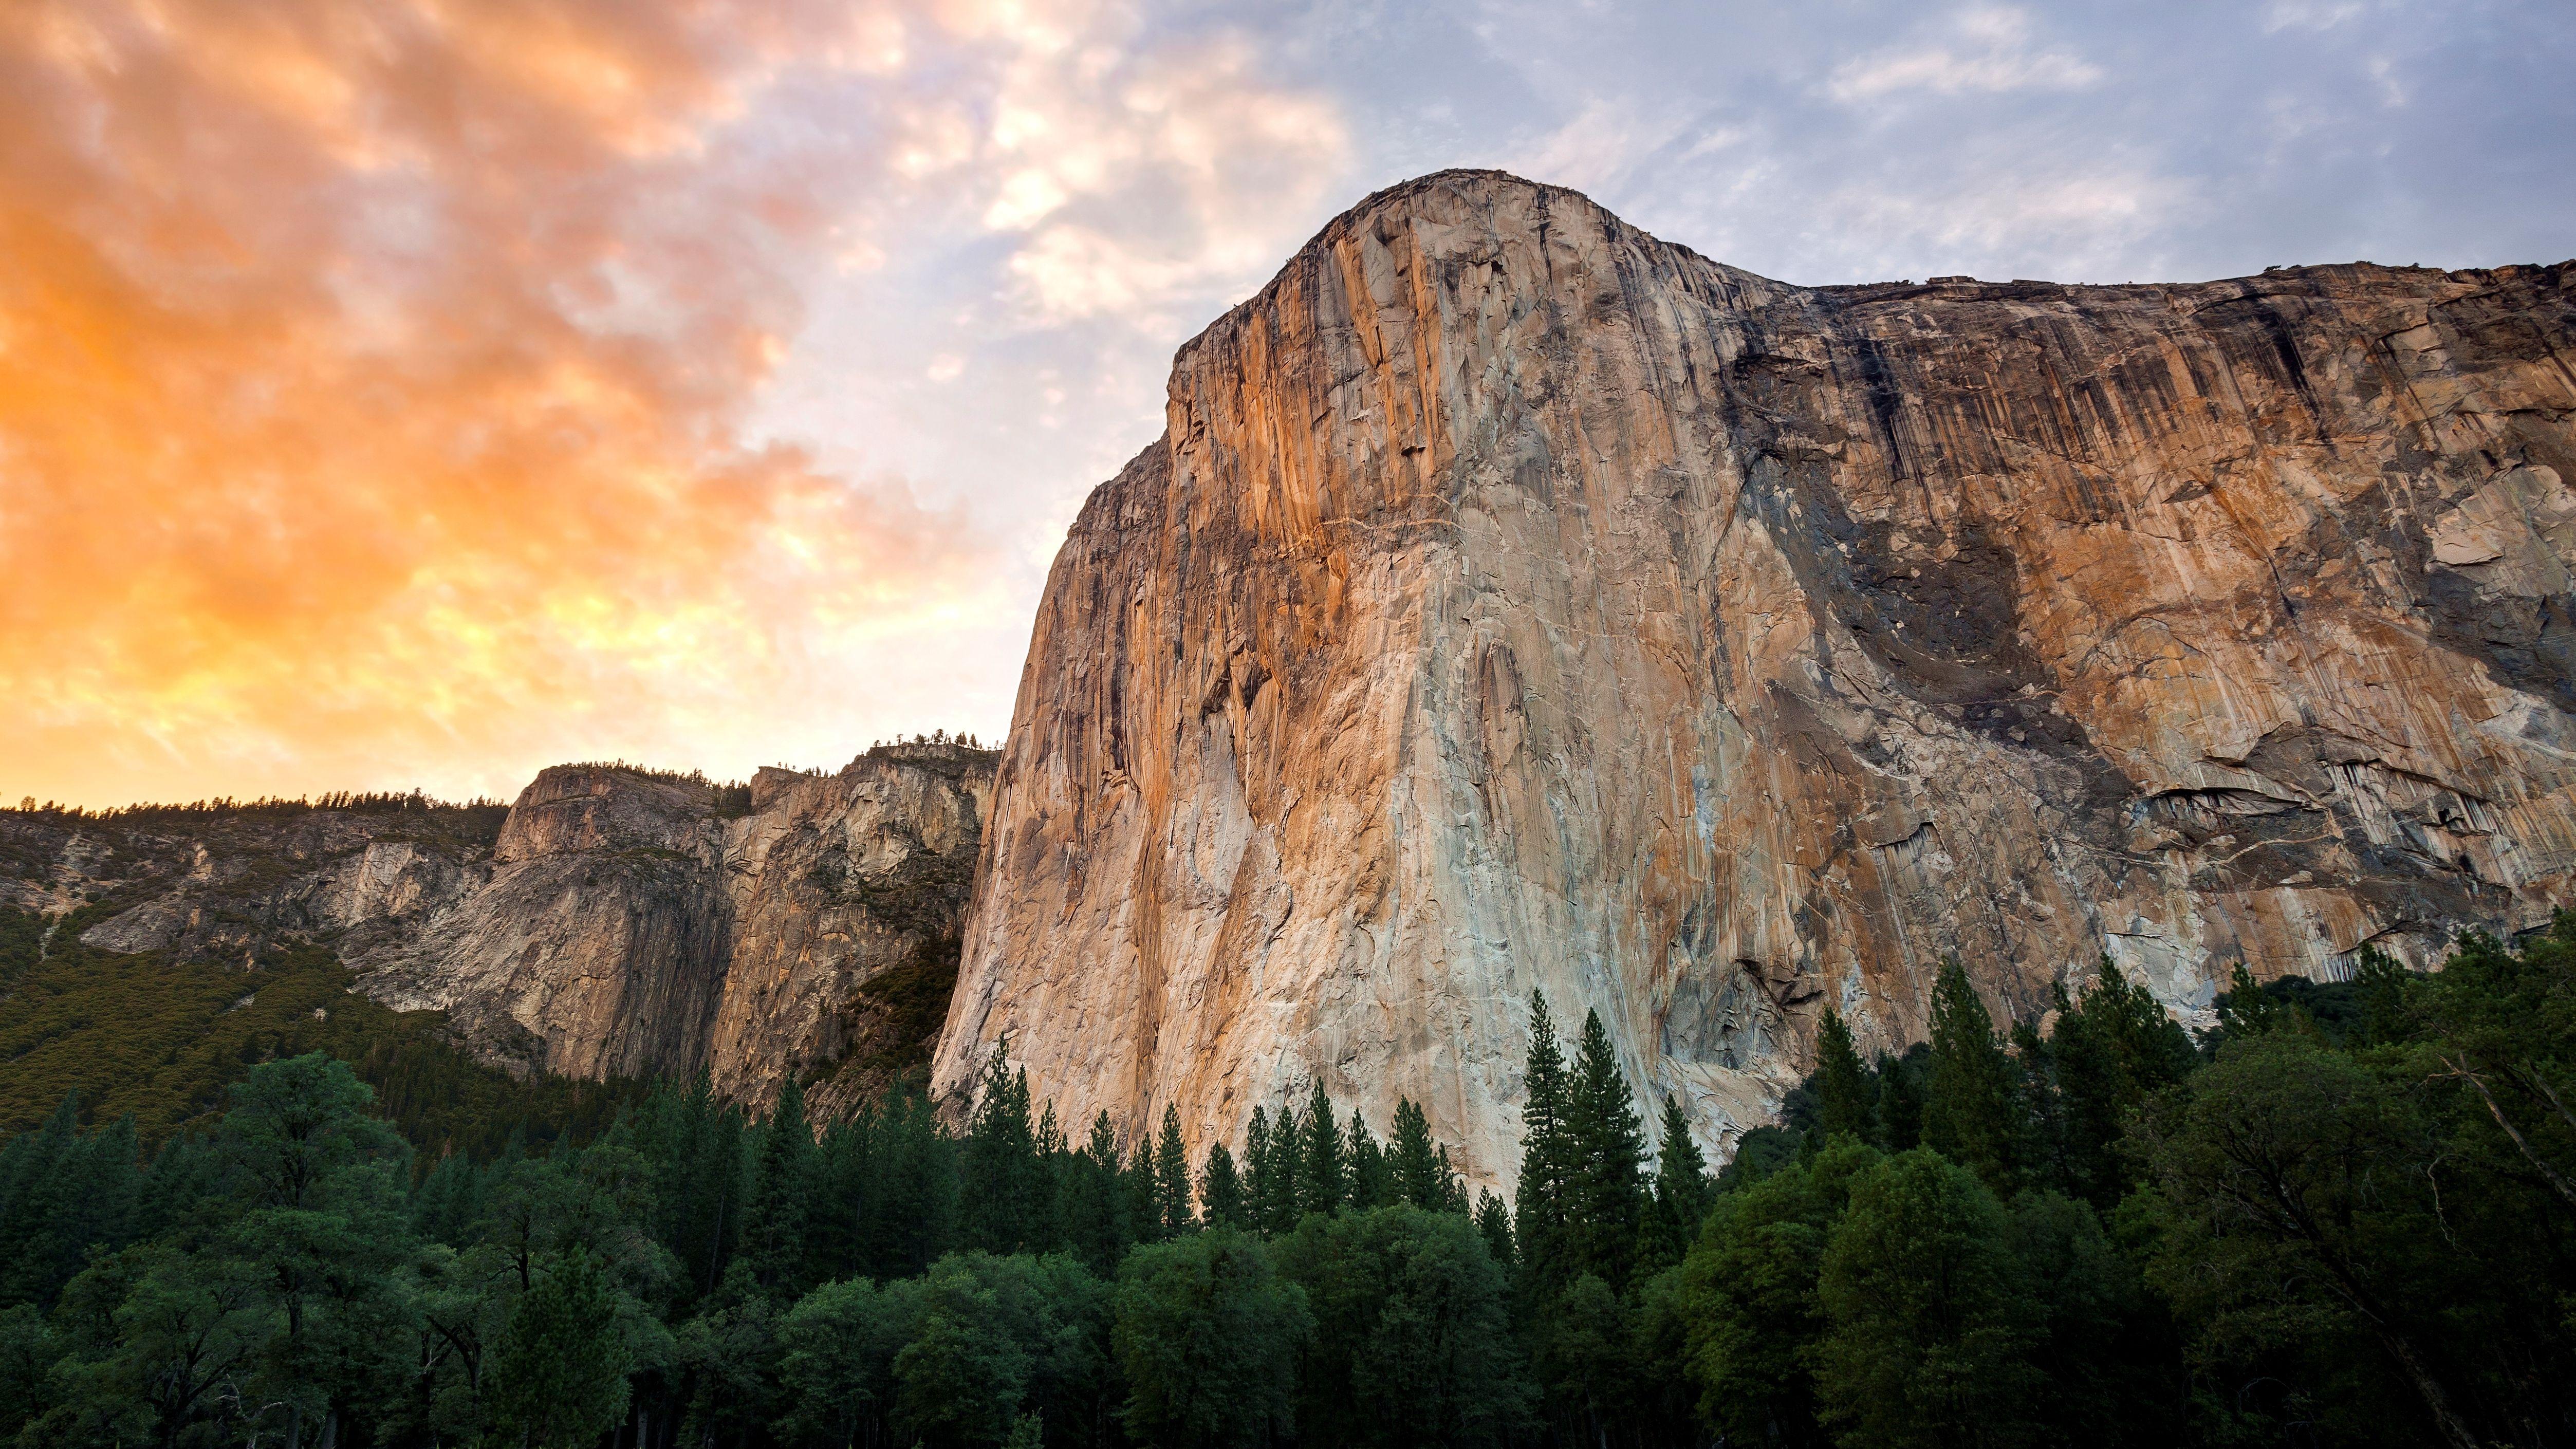 Mac Os Wallpaper 4k Zip Ideas In 2020 Mac Os Wallpaper Wallpaper Yosemite